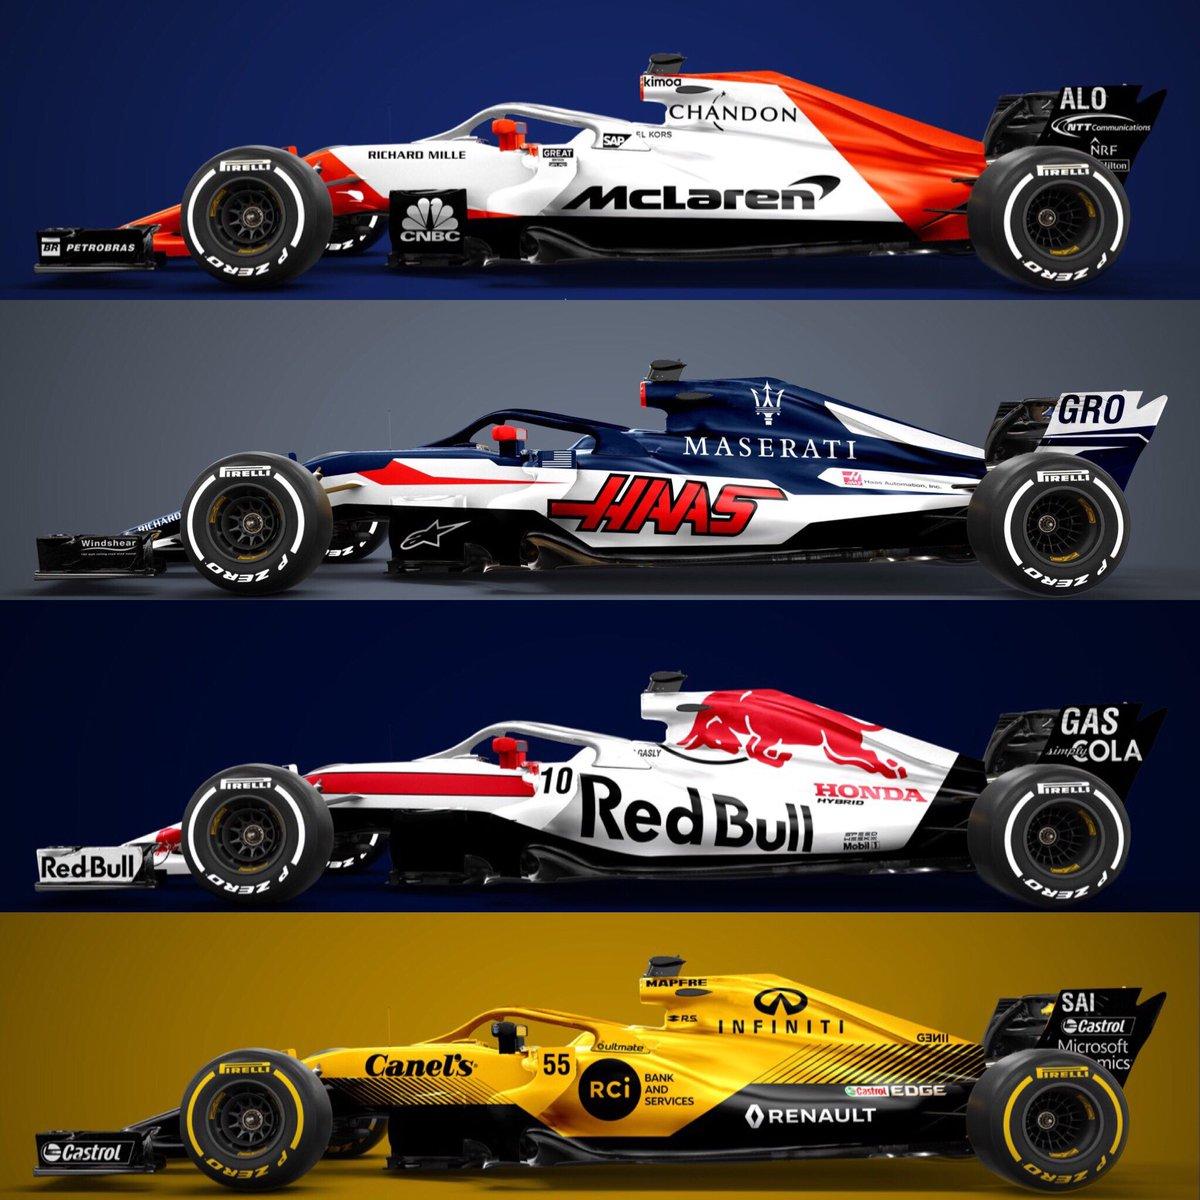 Sean Bull Design On Twitter Recent Vote Winning F1 2018 Liveries